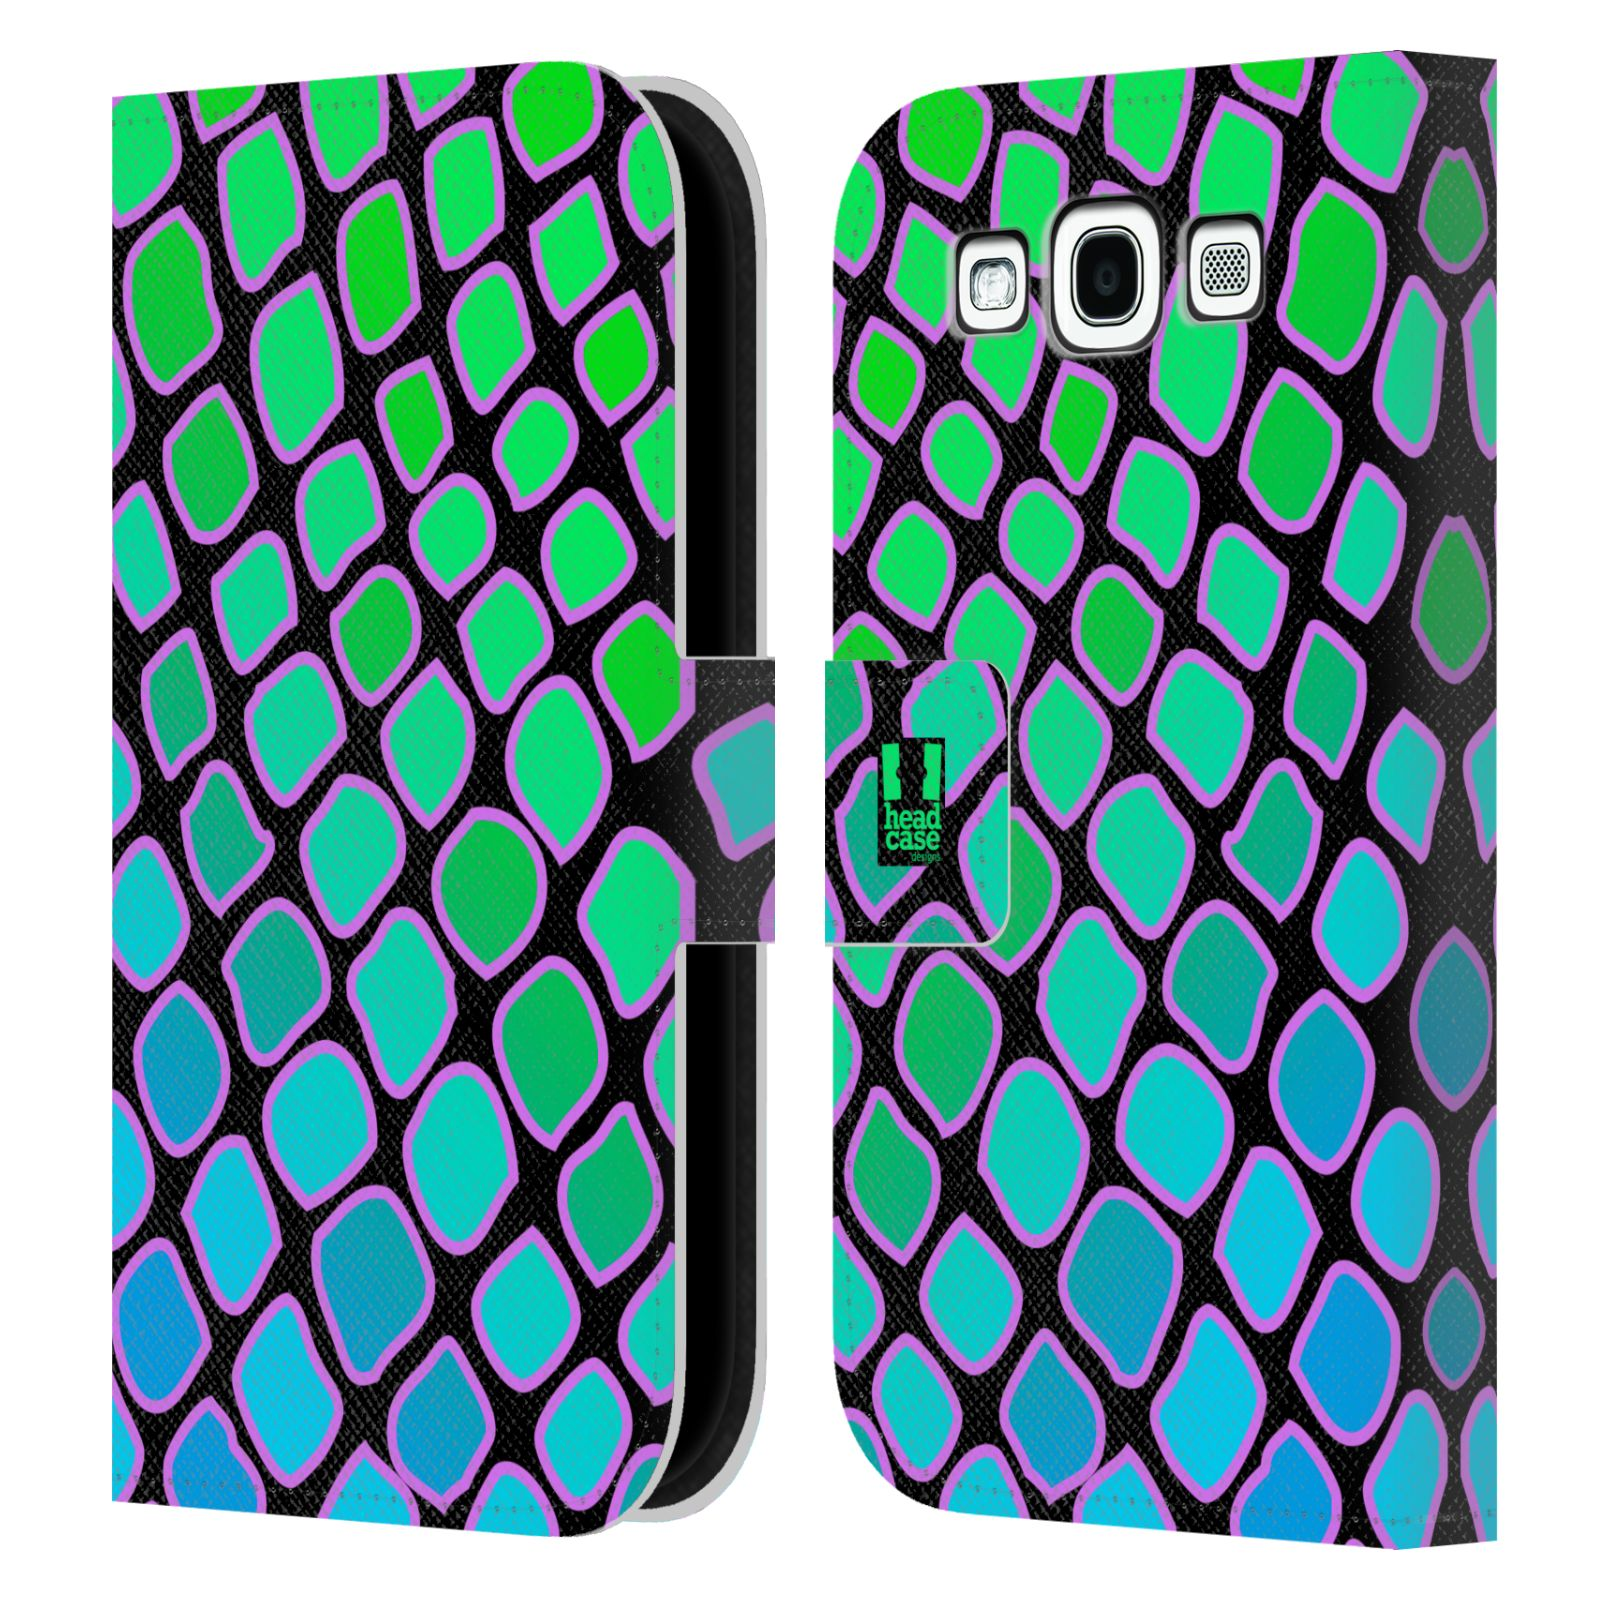 HEAD CASE Flipové pouzdro pro mobil Samsung Galaxy S3 Zvířecí barevné vzory vodní had modrá a zelená barva AQUA